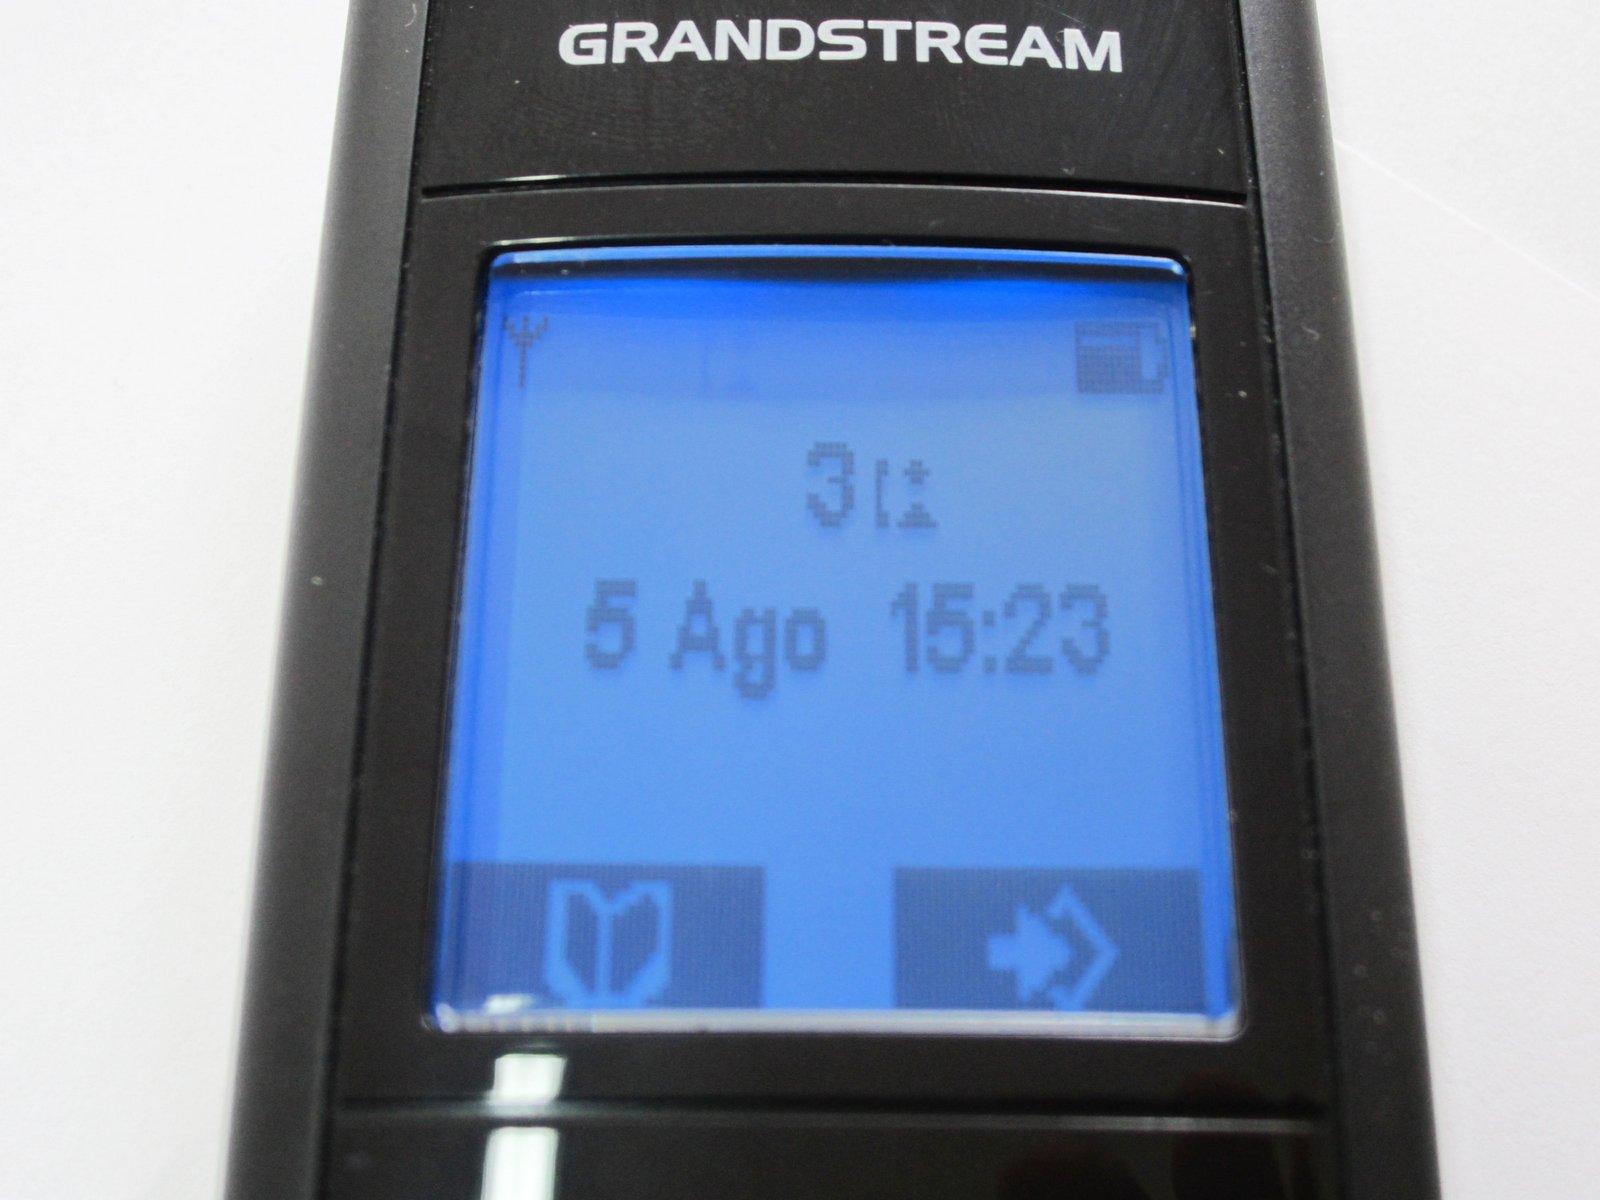 Grandstream-DP715_6